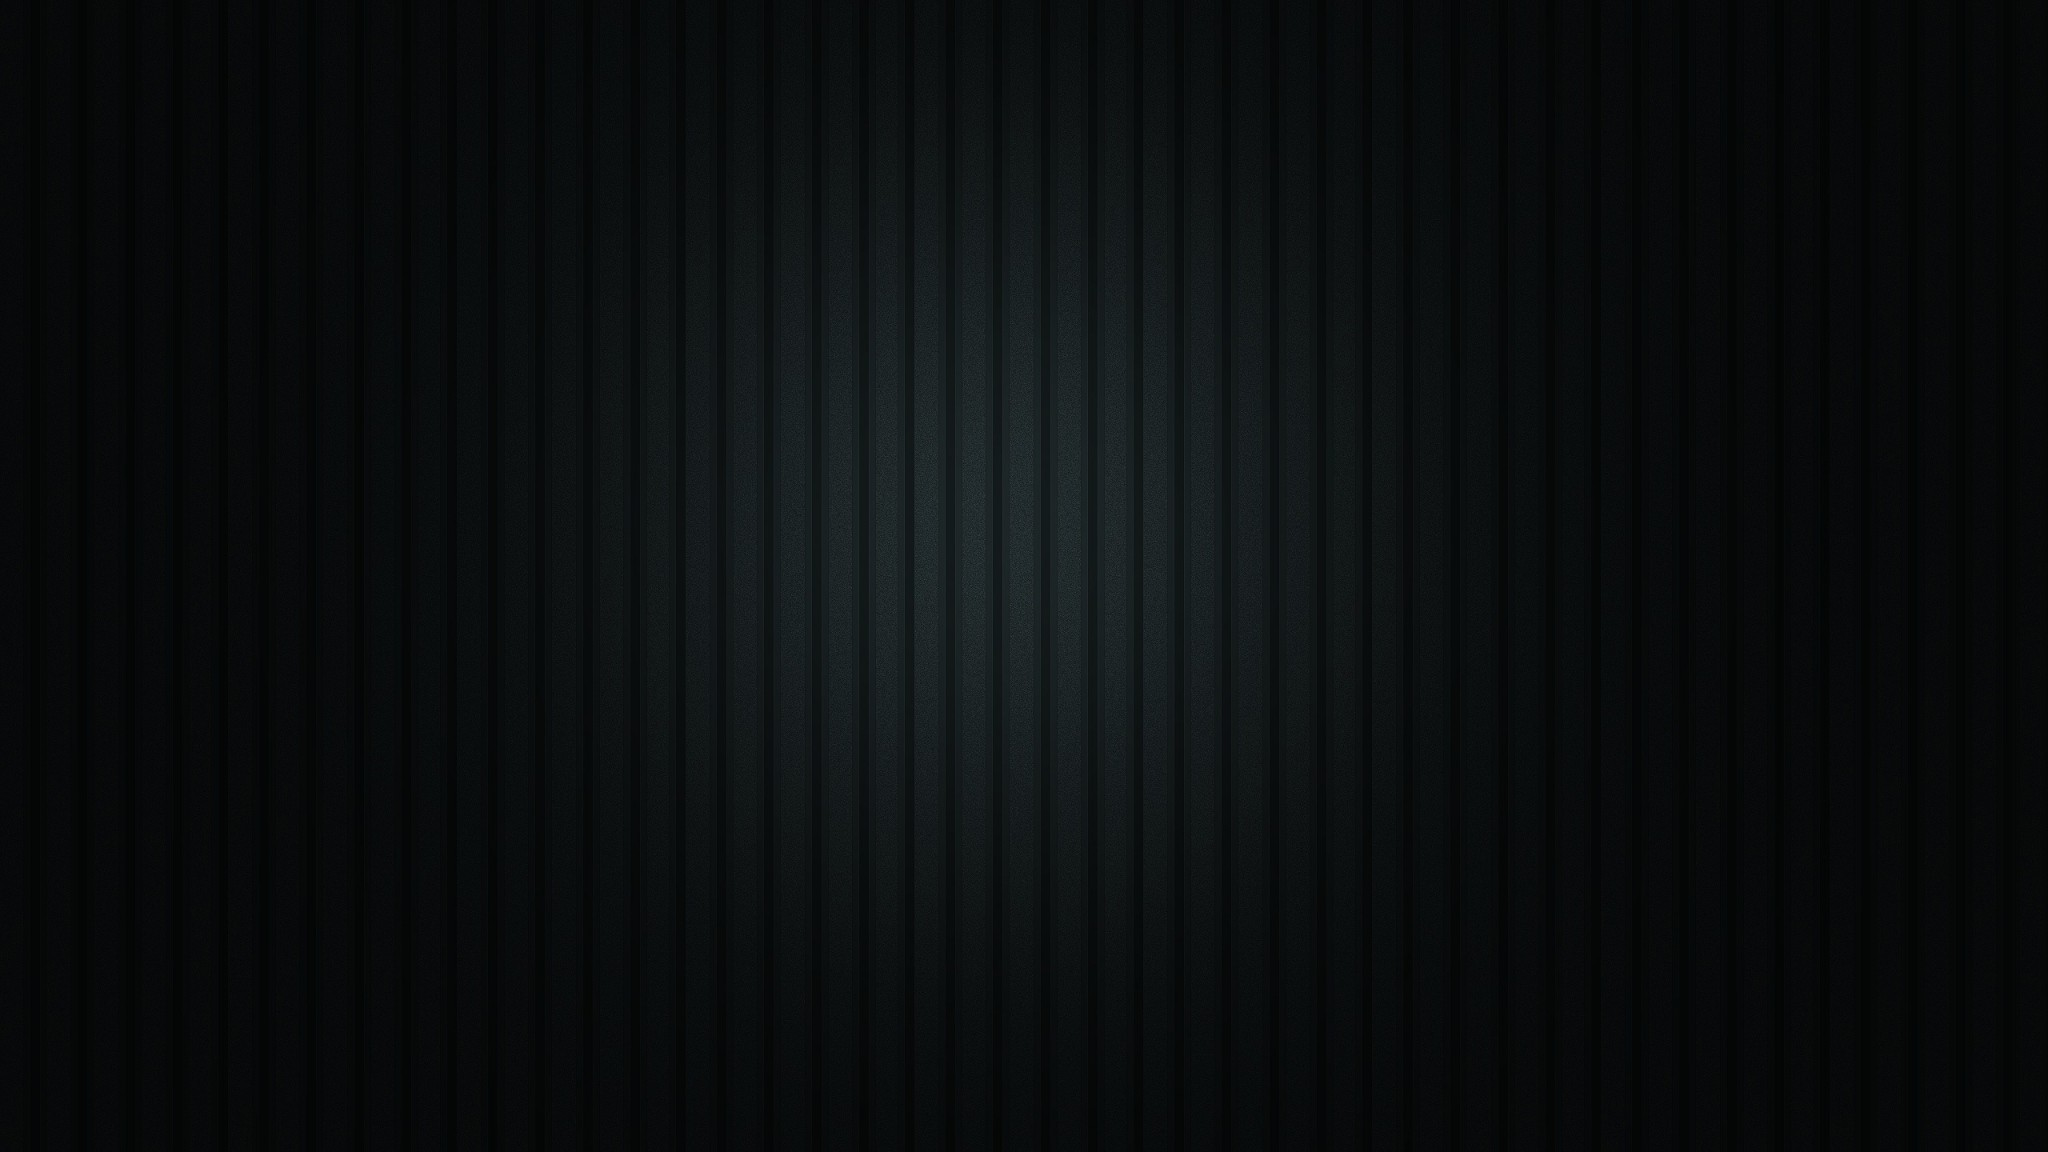 Wallpaper black, lines, background, spot